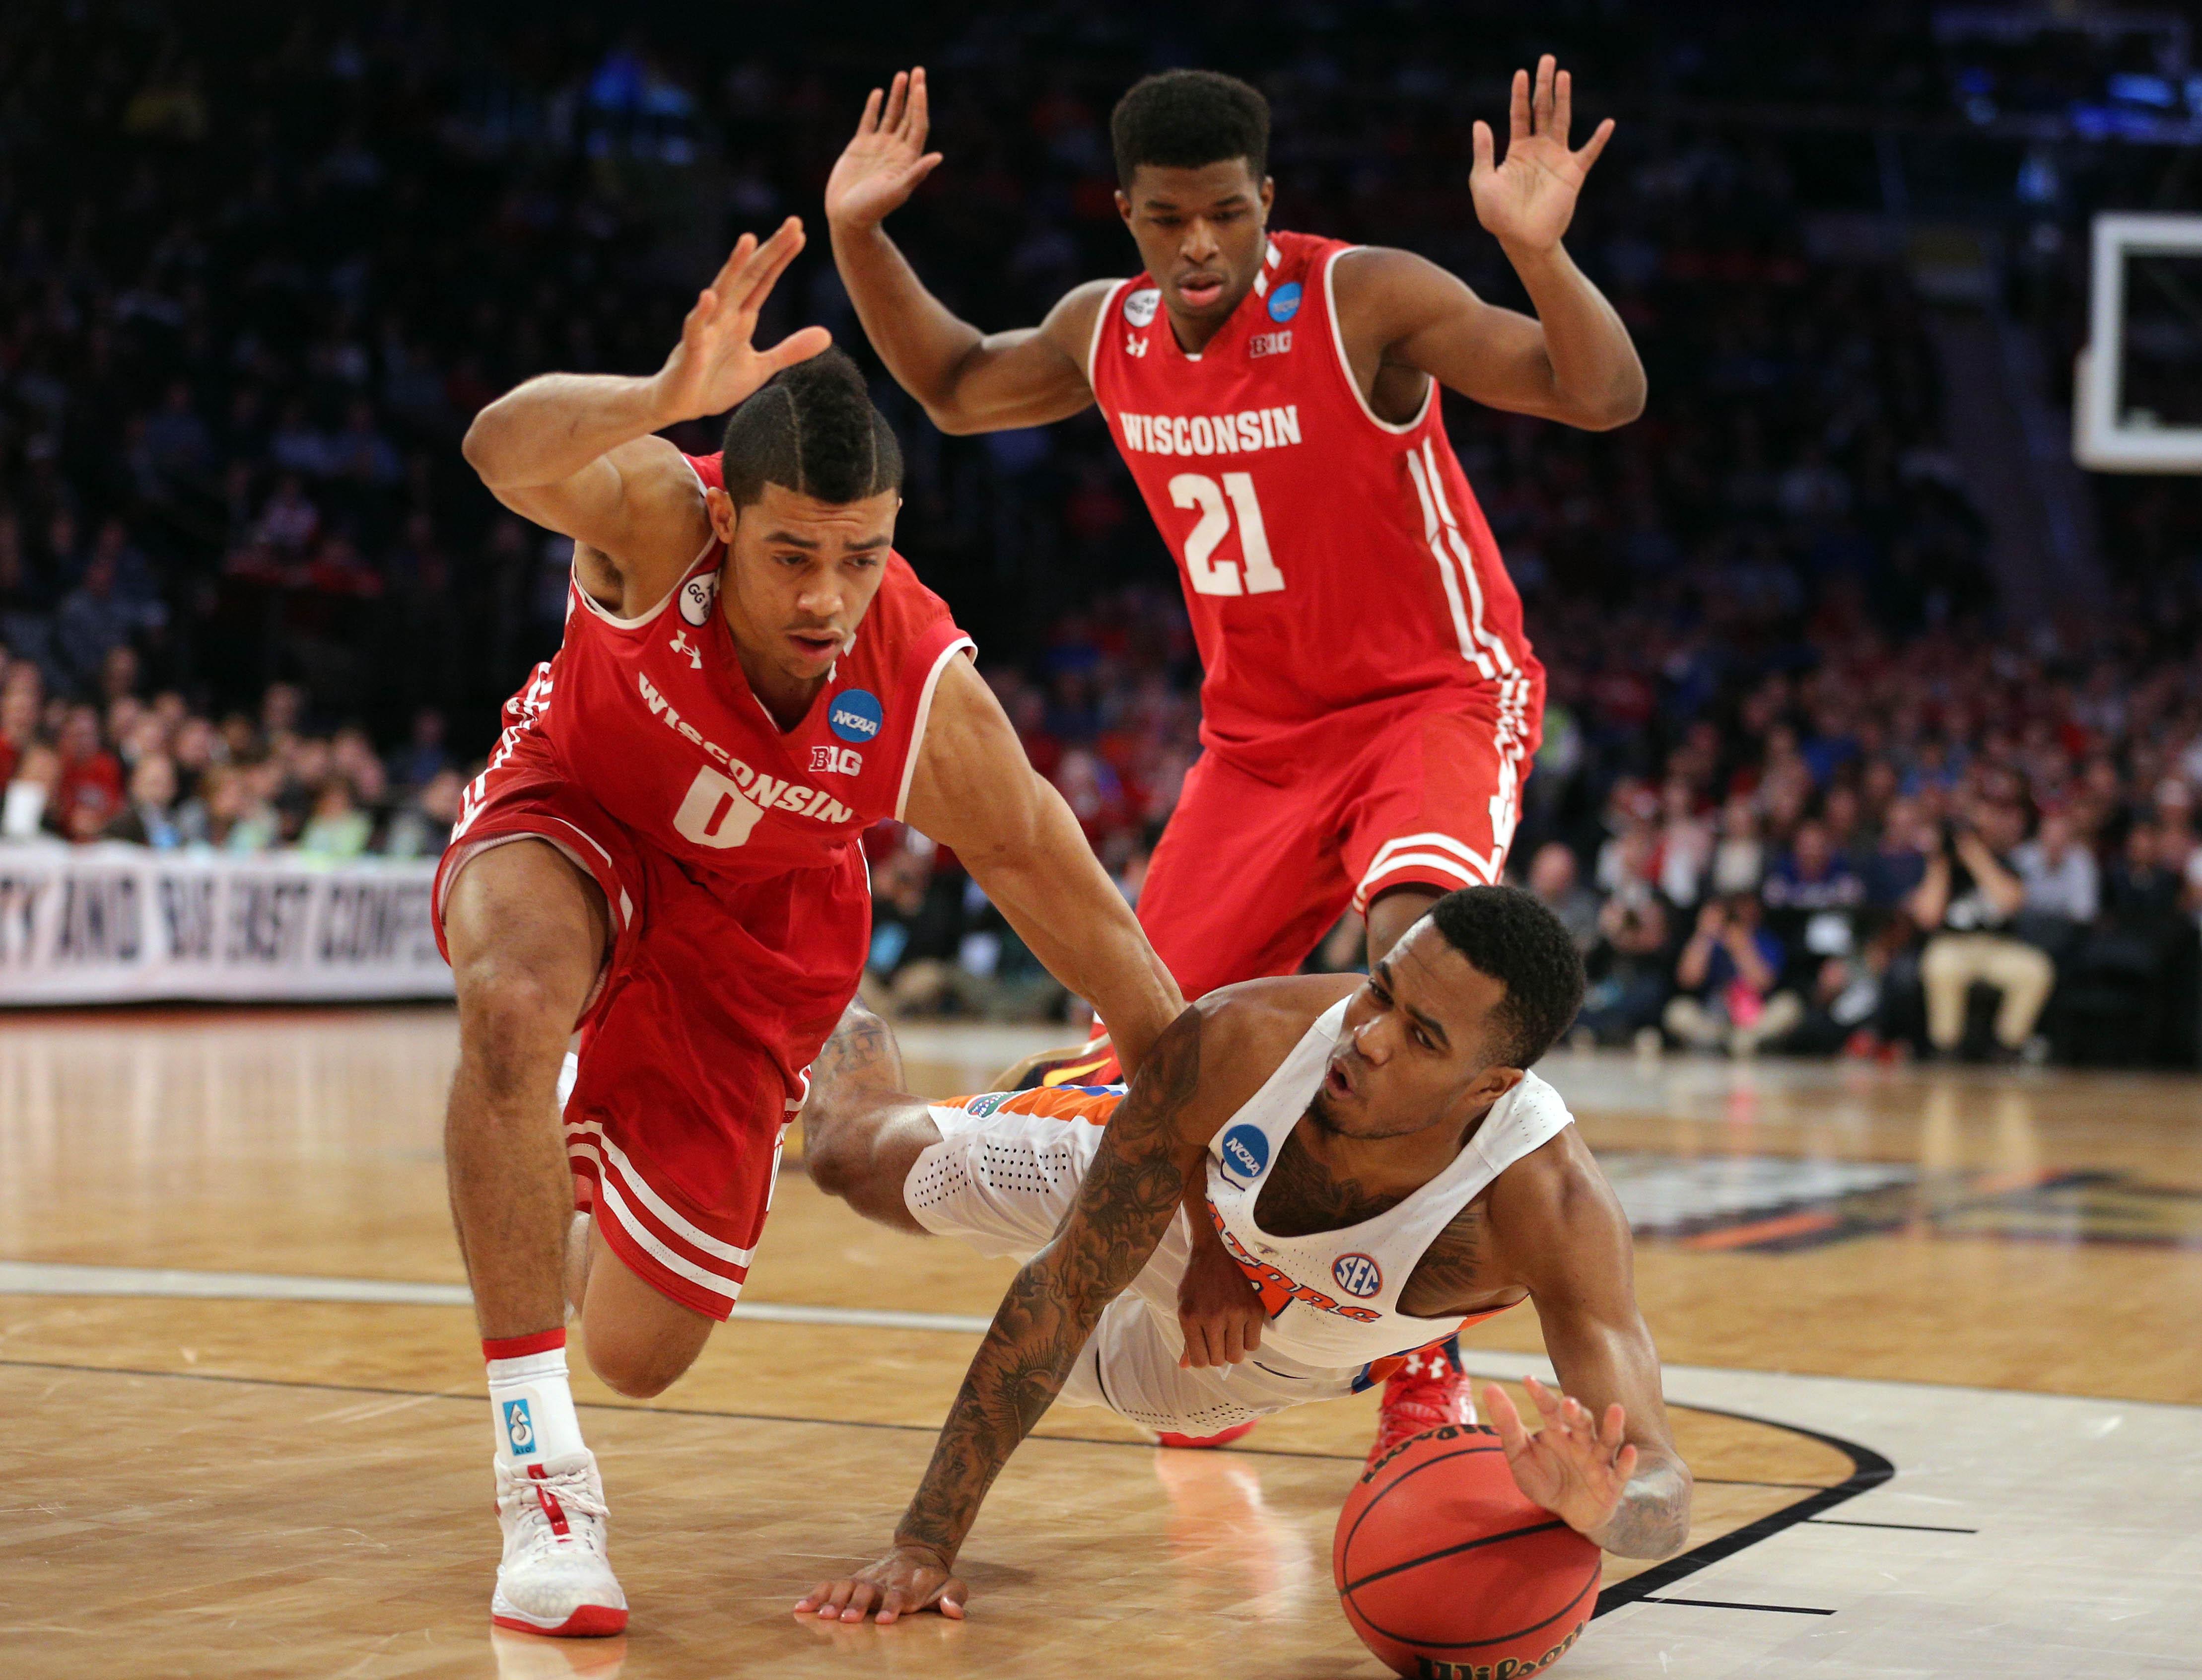 9969095-ncaa-basketball-ncaa-tournament-east-regional-wisconsin-vs-florida